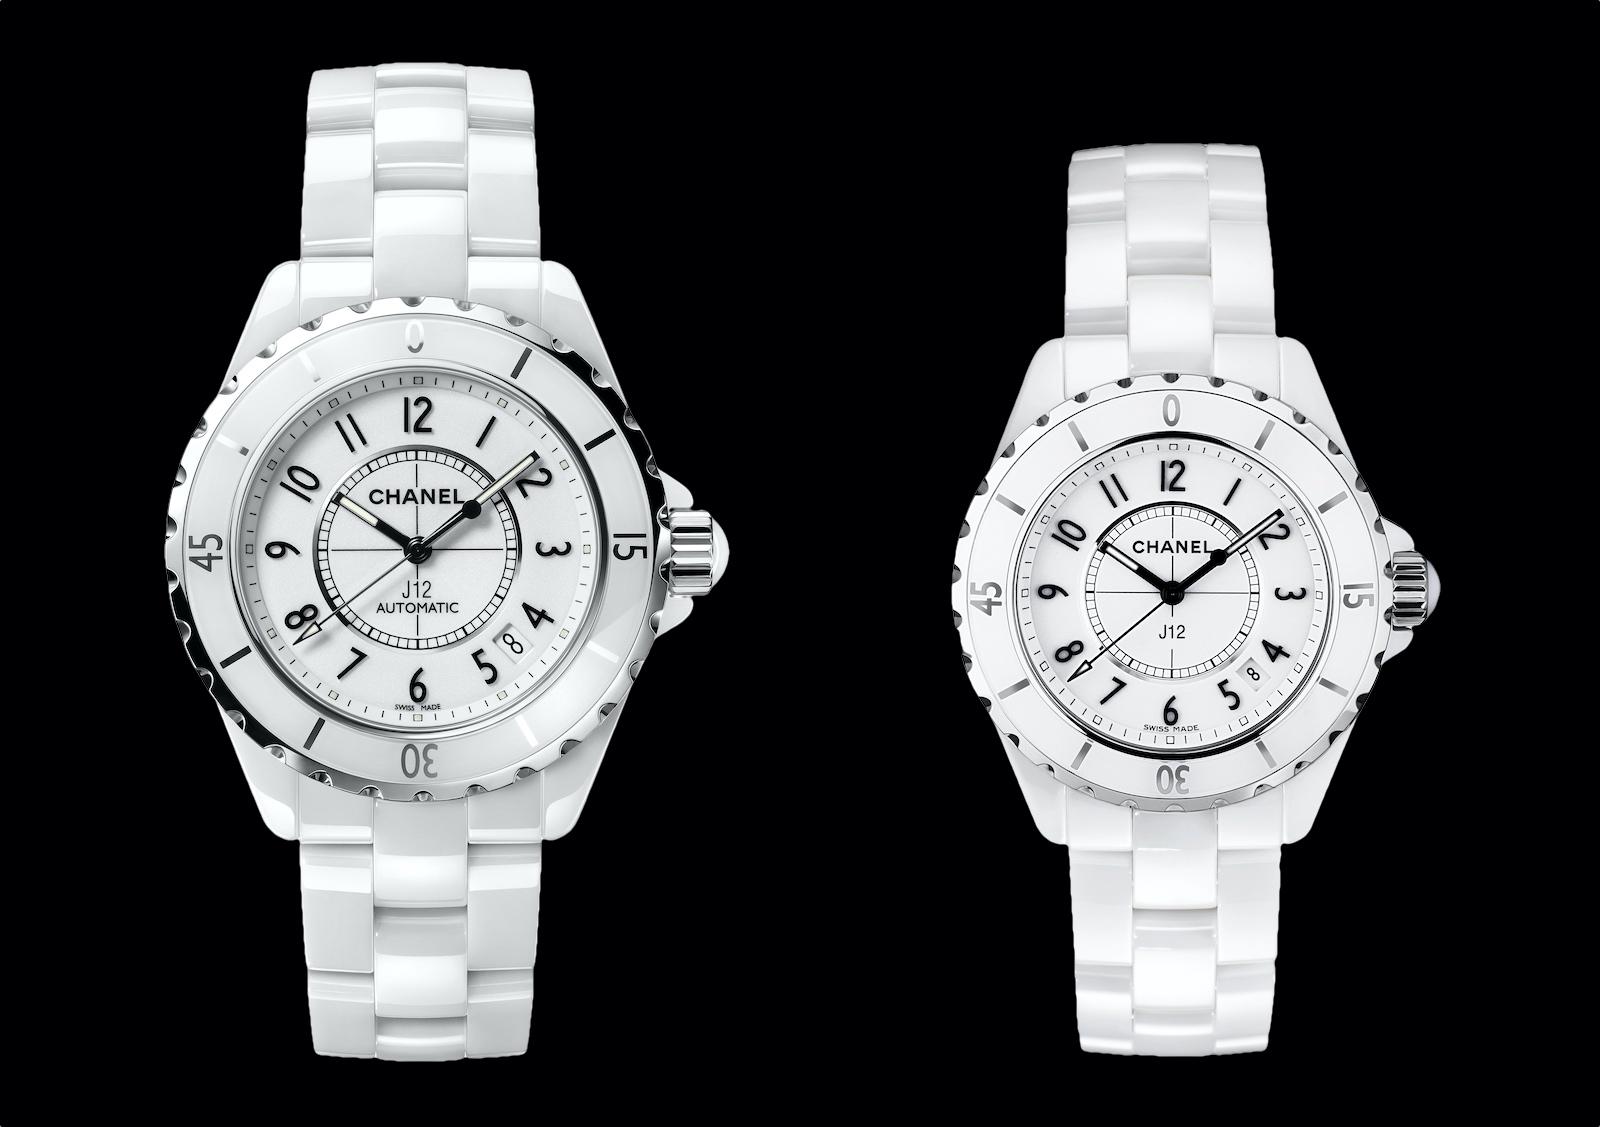 Historia del Chanel J12 - 2003 - J12 white 38-33 mm